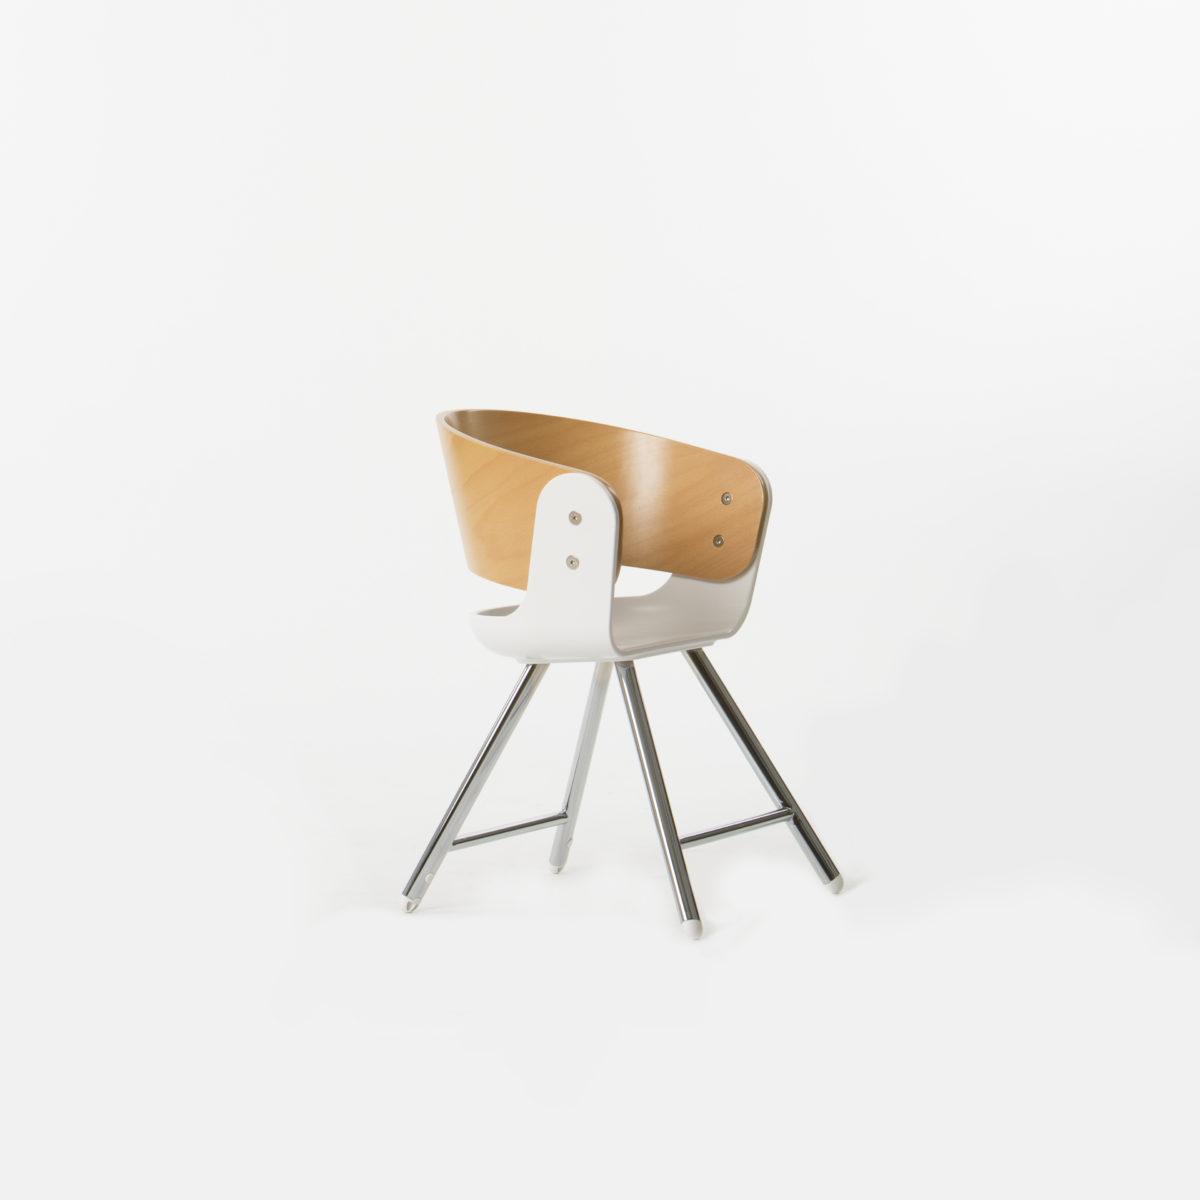 iCandy MiChair - Chair Mode 3-4 left-jpg